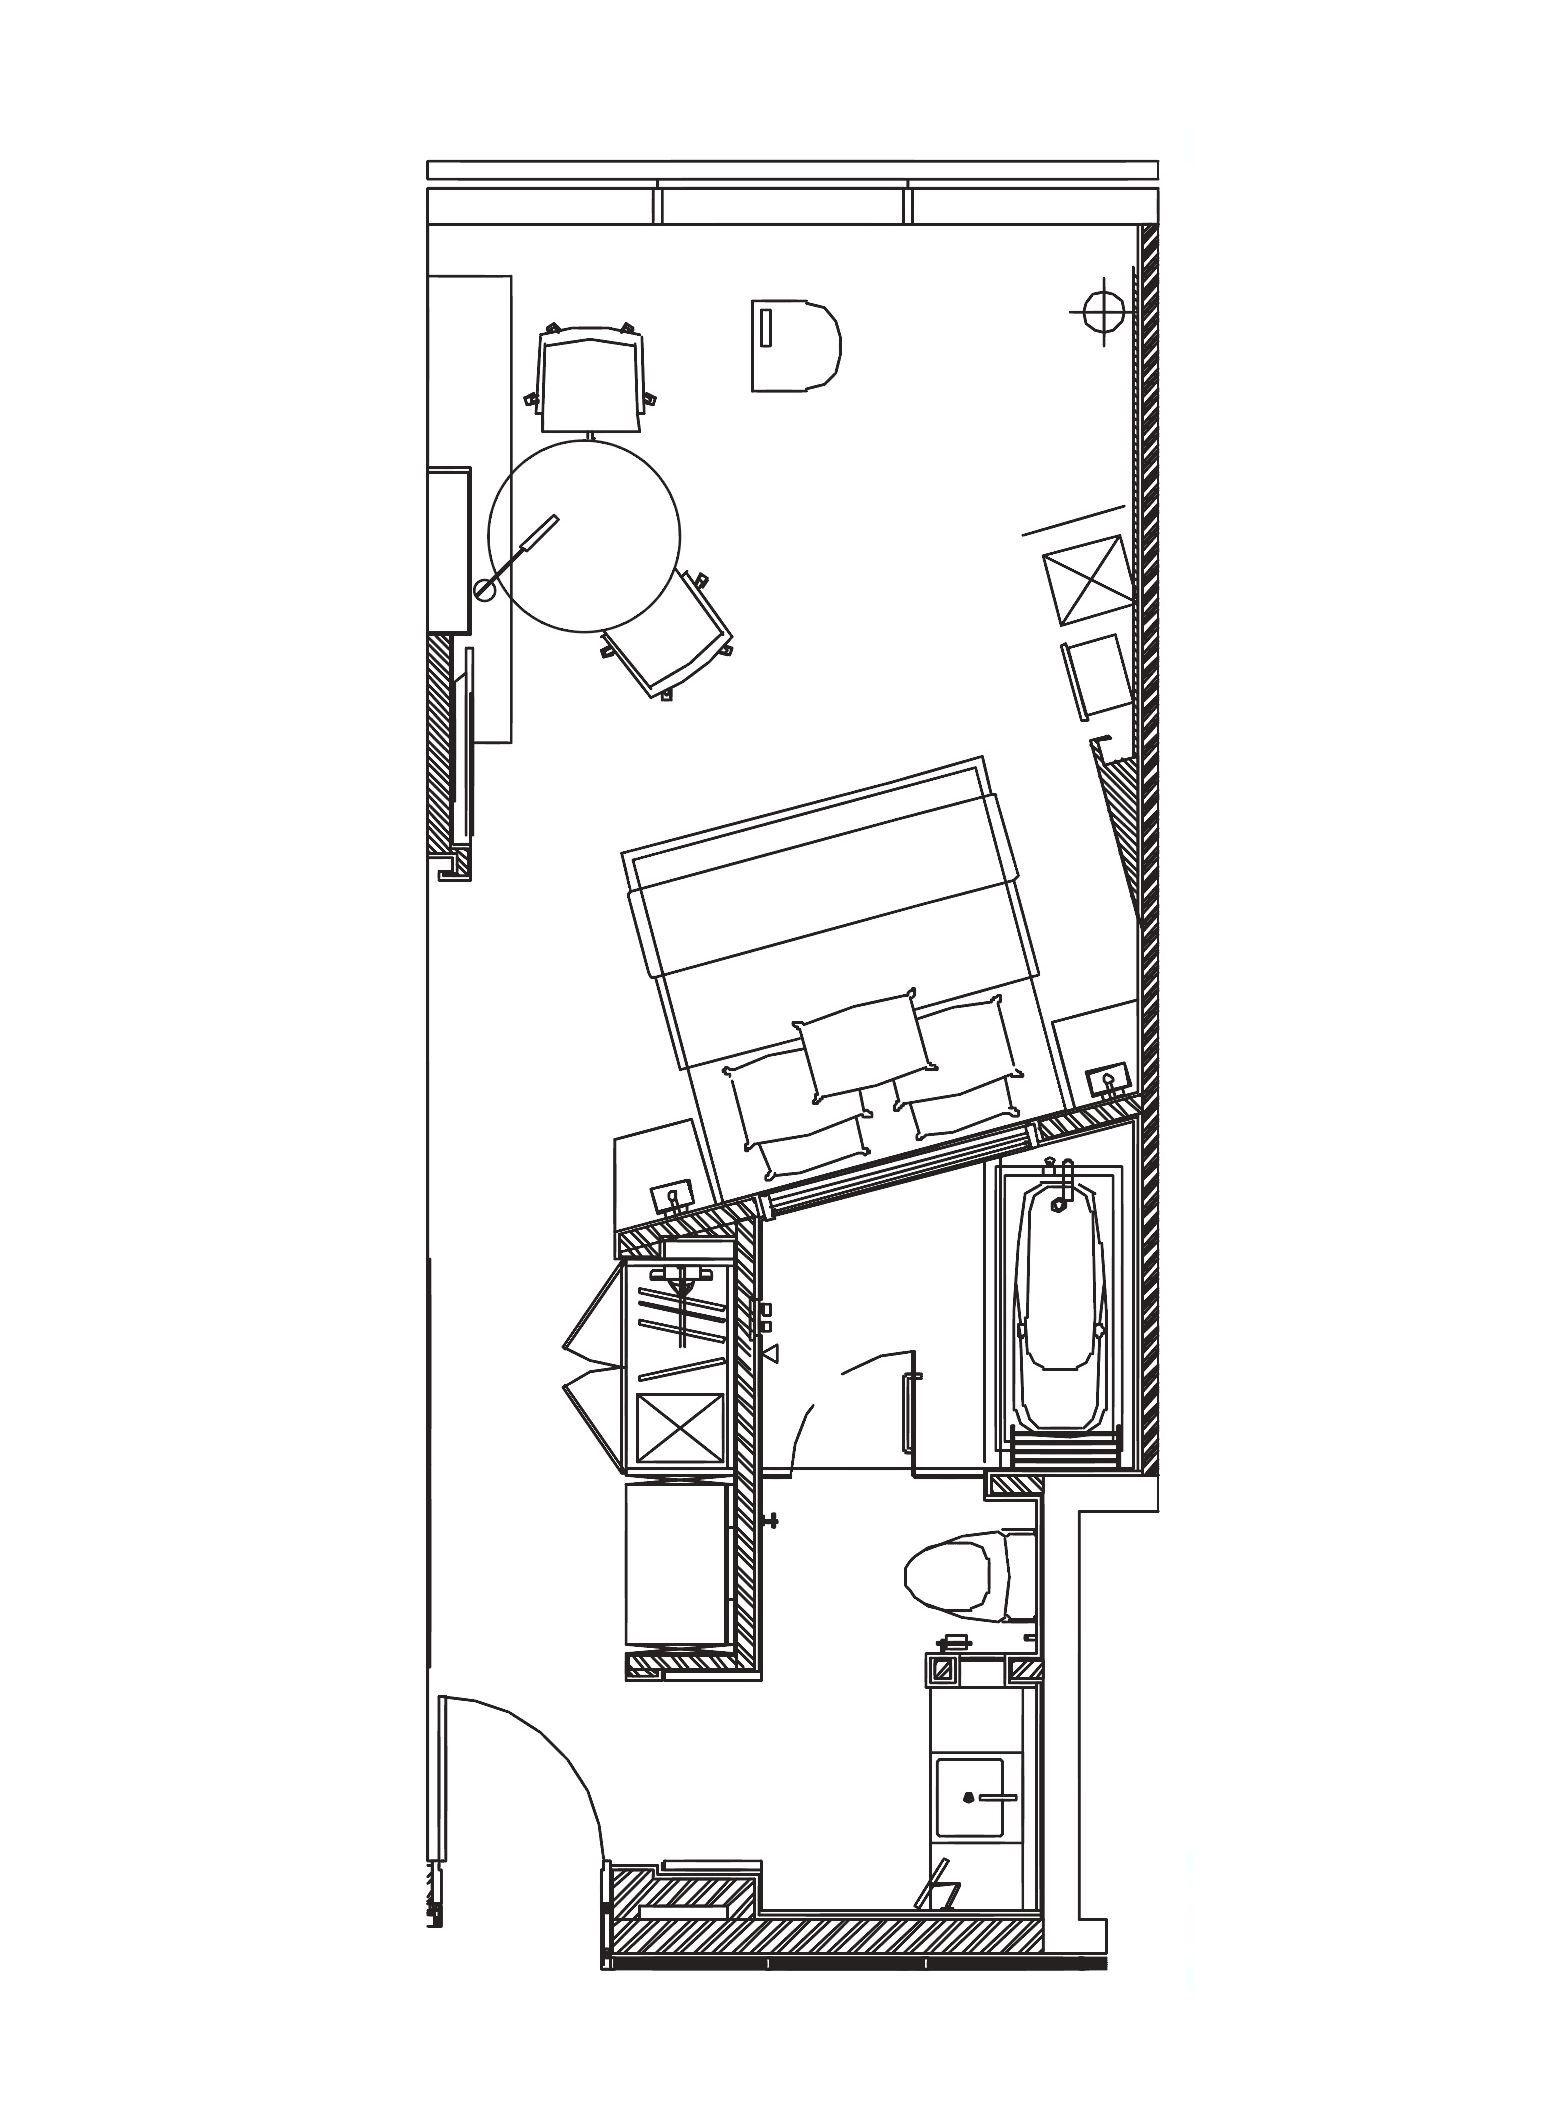 Hotel Nikko Suzhou Executive Room 37 43 M Hotel Room Design Plan Hotel Room Design Hotel Room Plan